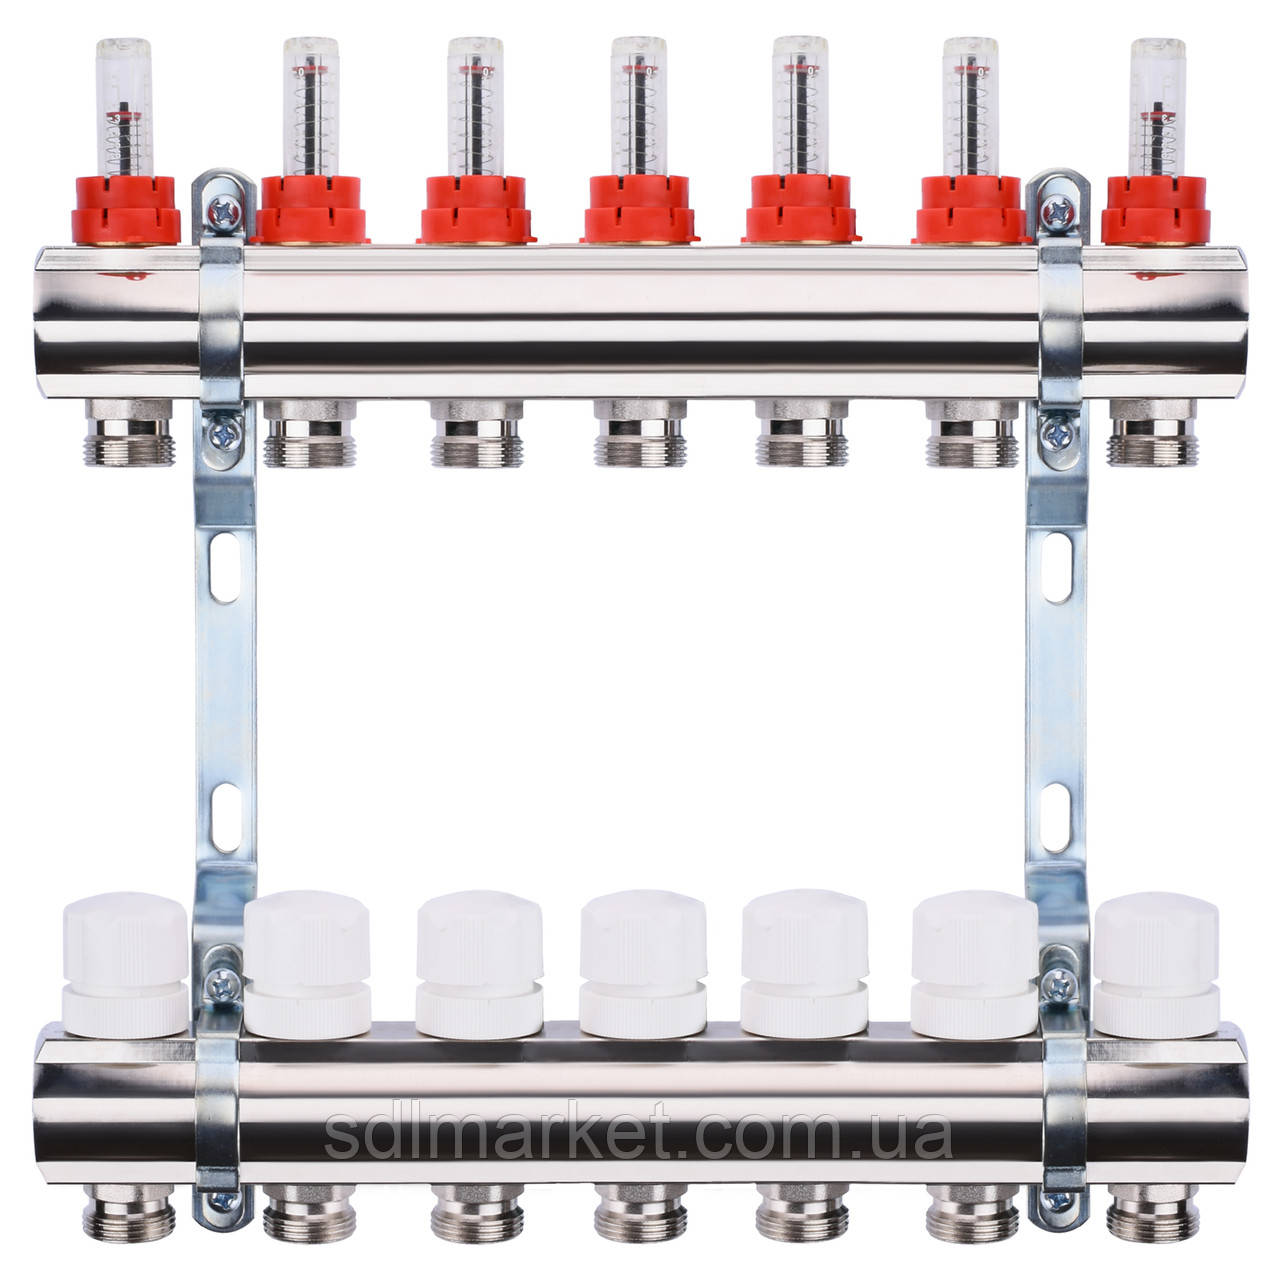 "Коллектор с расходомерами, регуляторами и креплением ECO 001A 1""x7"